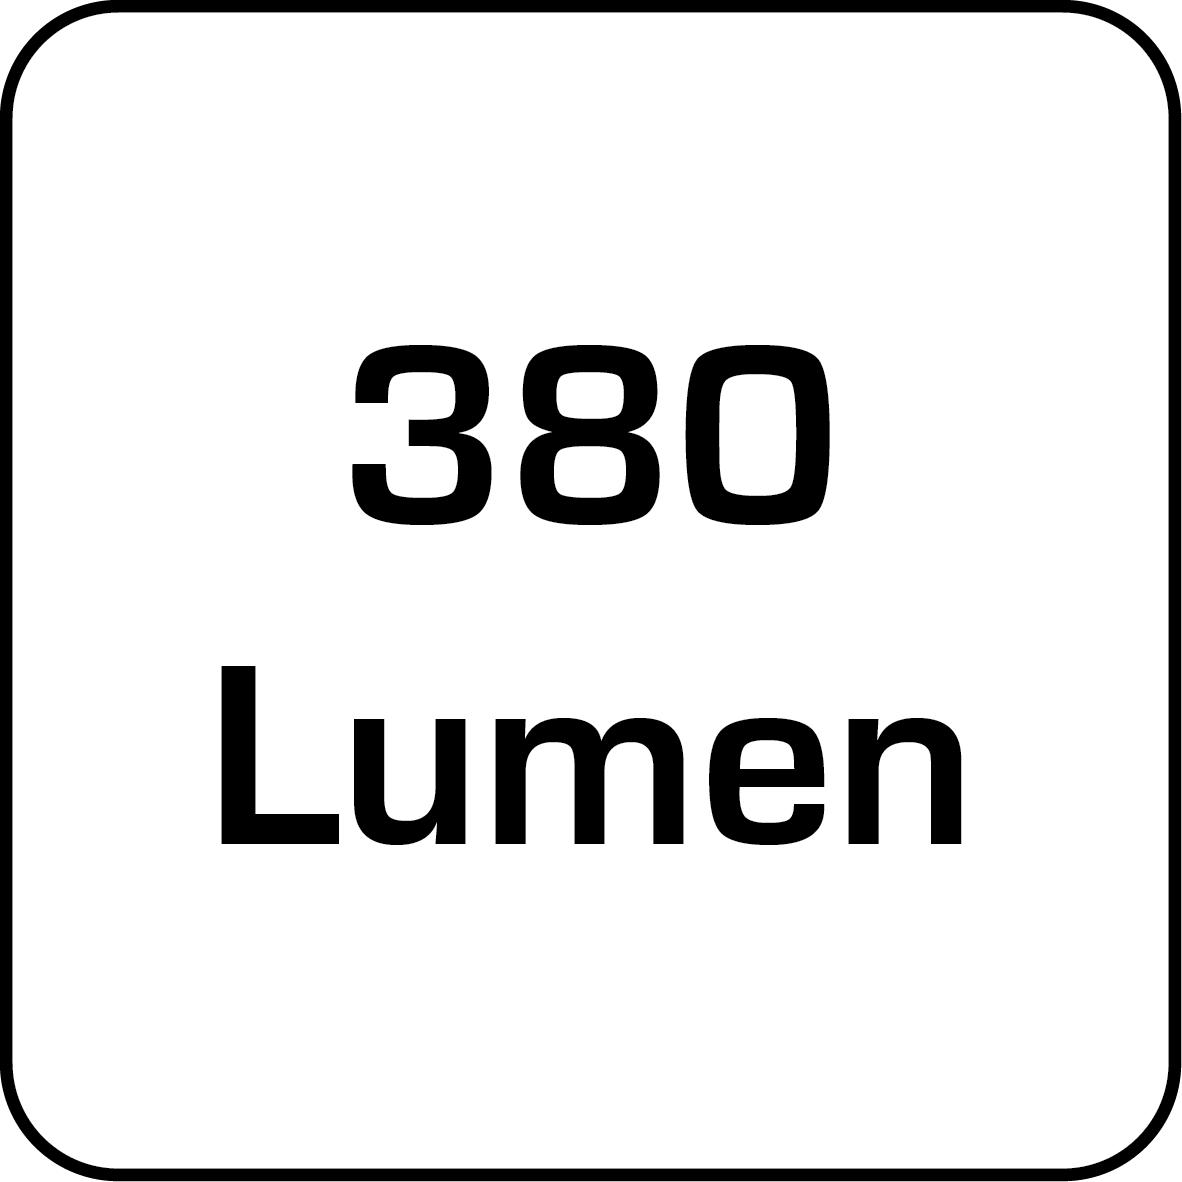 11-380-lumen